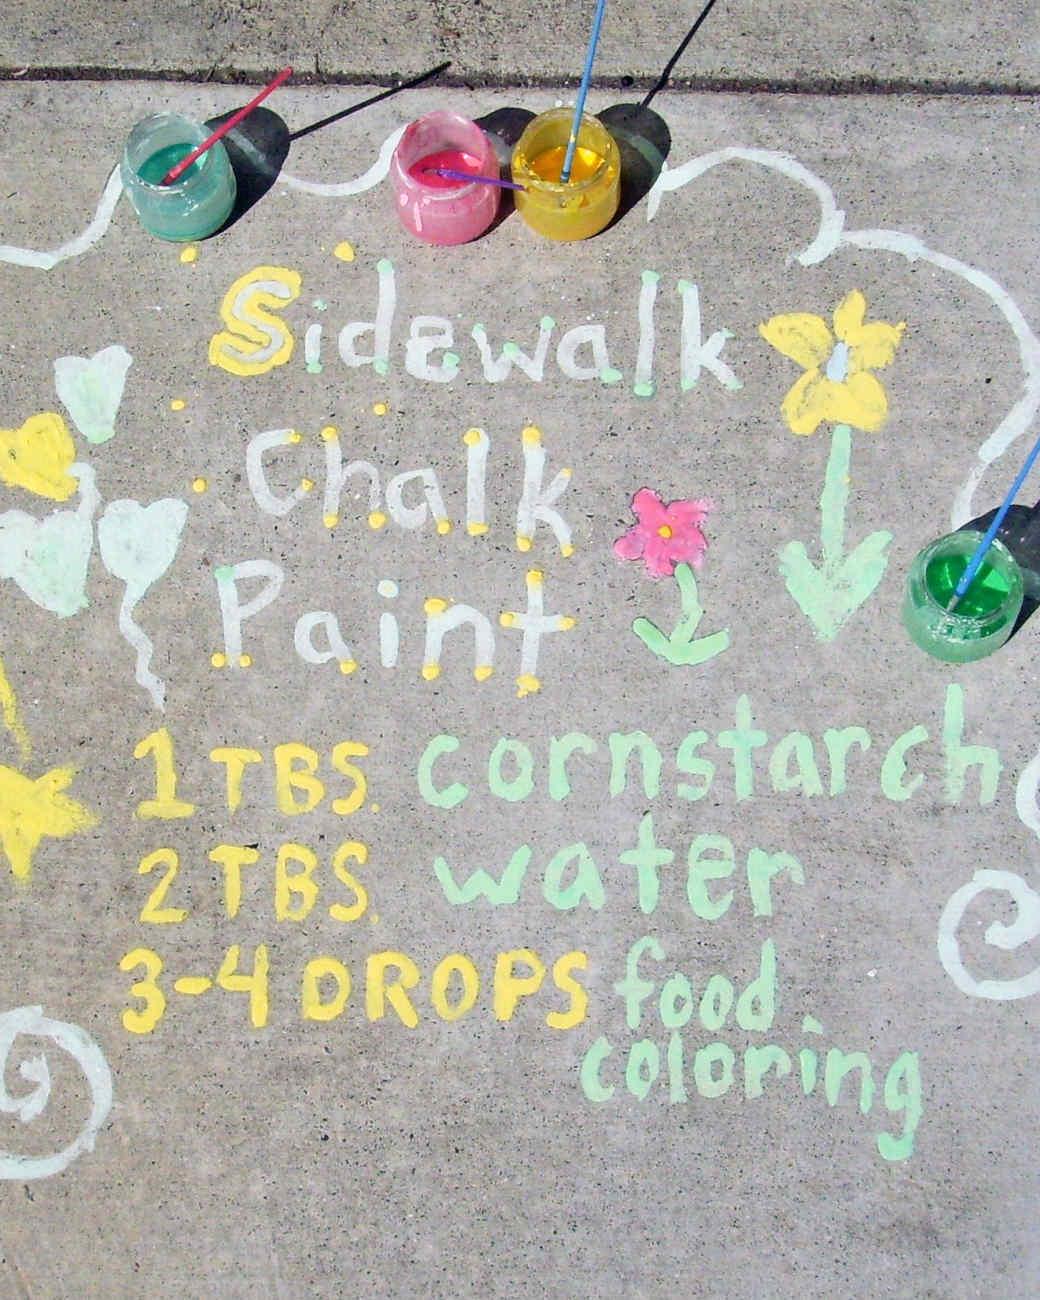 magic-sidewalk-chalk-paint-mamas-magic-studio-002-0714.jpg